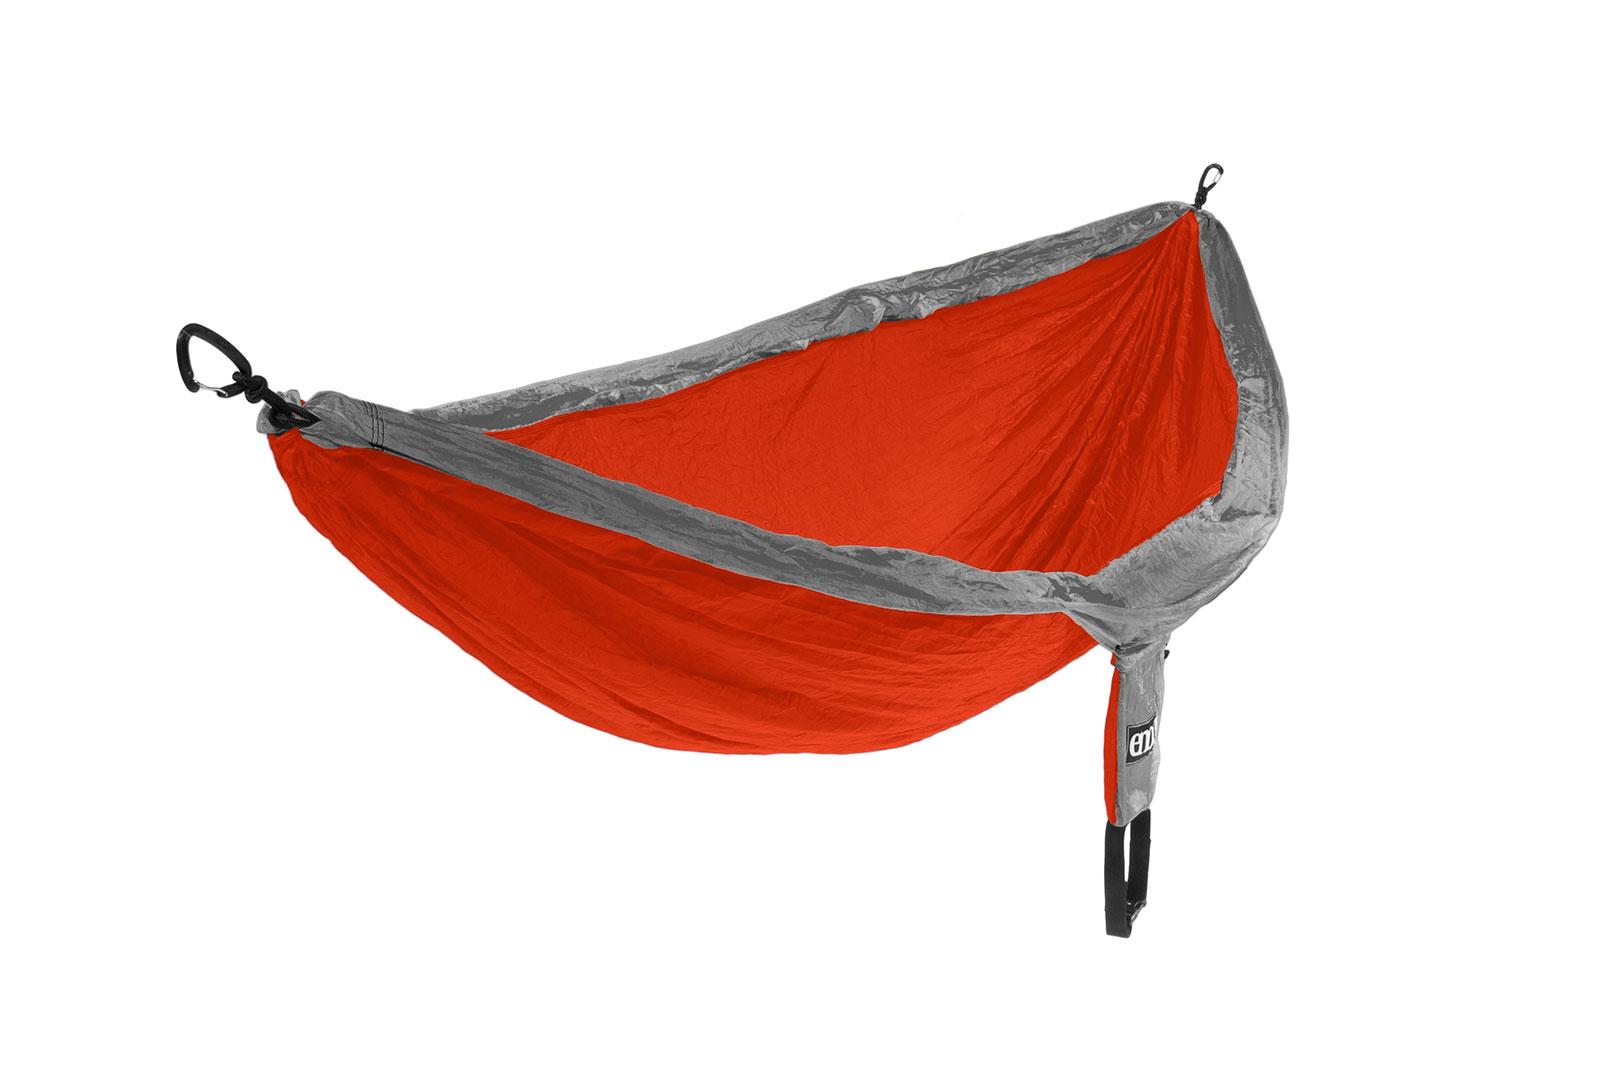 eno doublenest hammock outdoor camping backpacking nylon portable  eno doublenest hammock outdoor camping backpacking nylon portable      rh   ebay